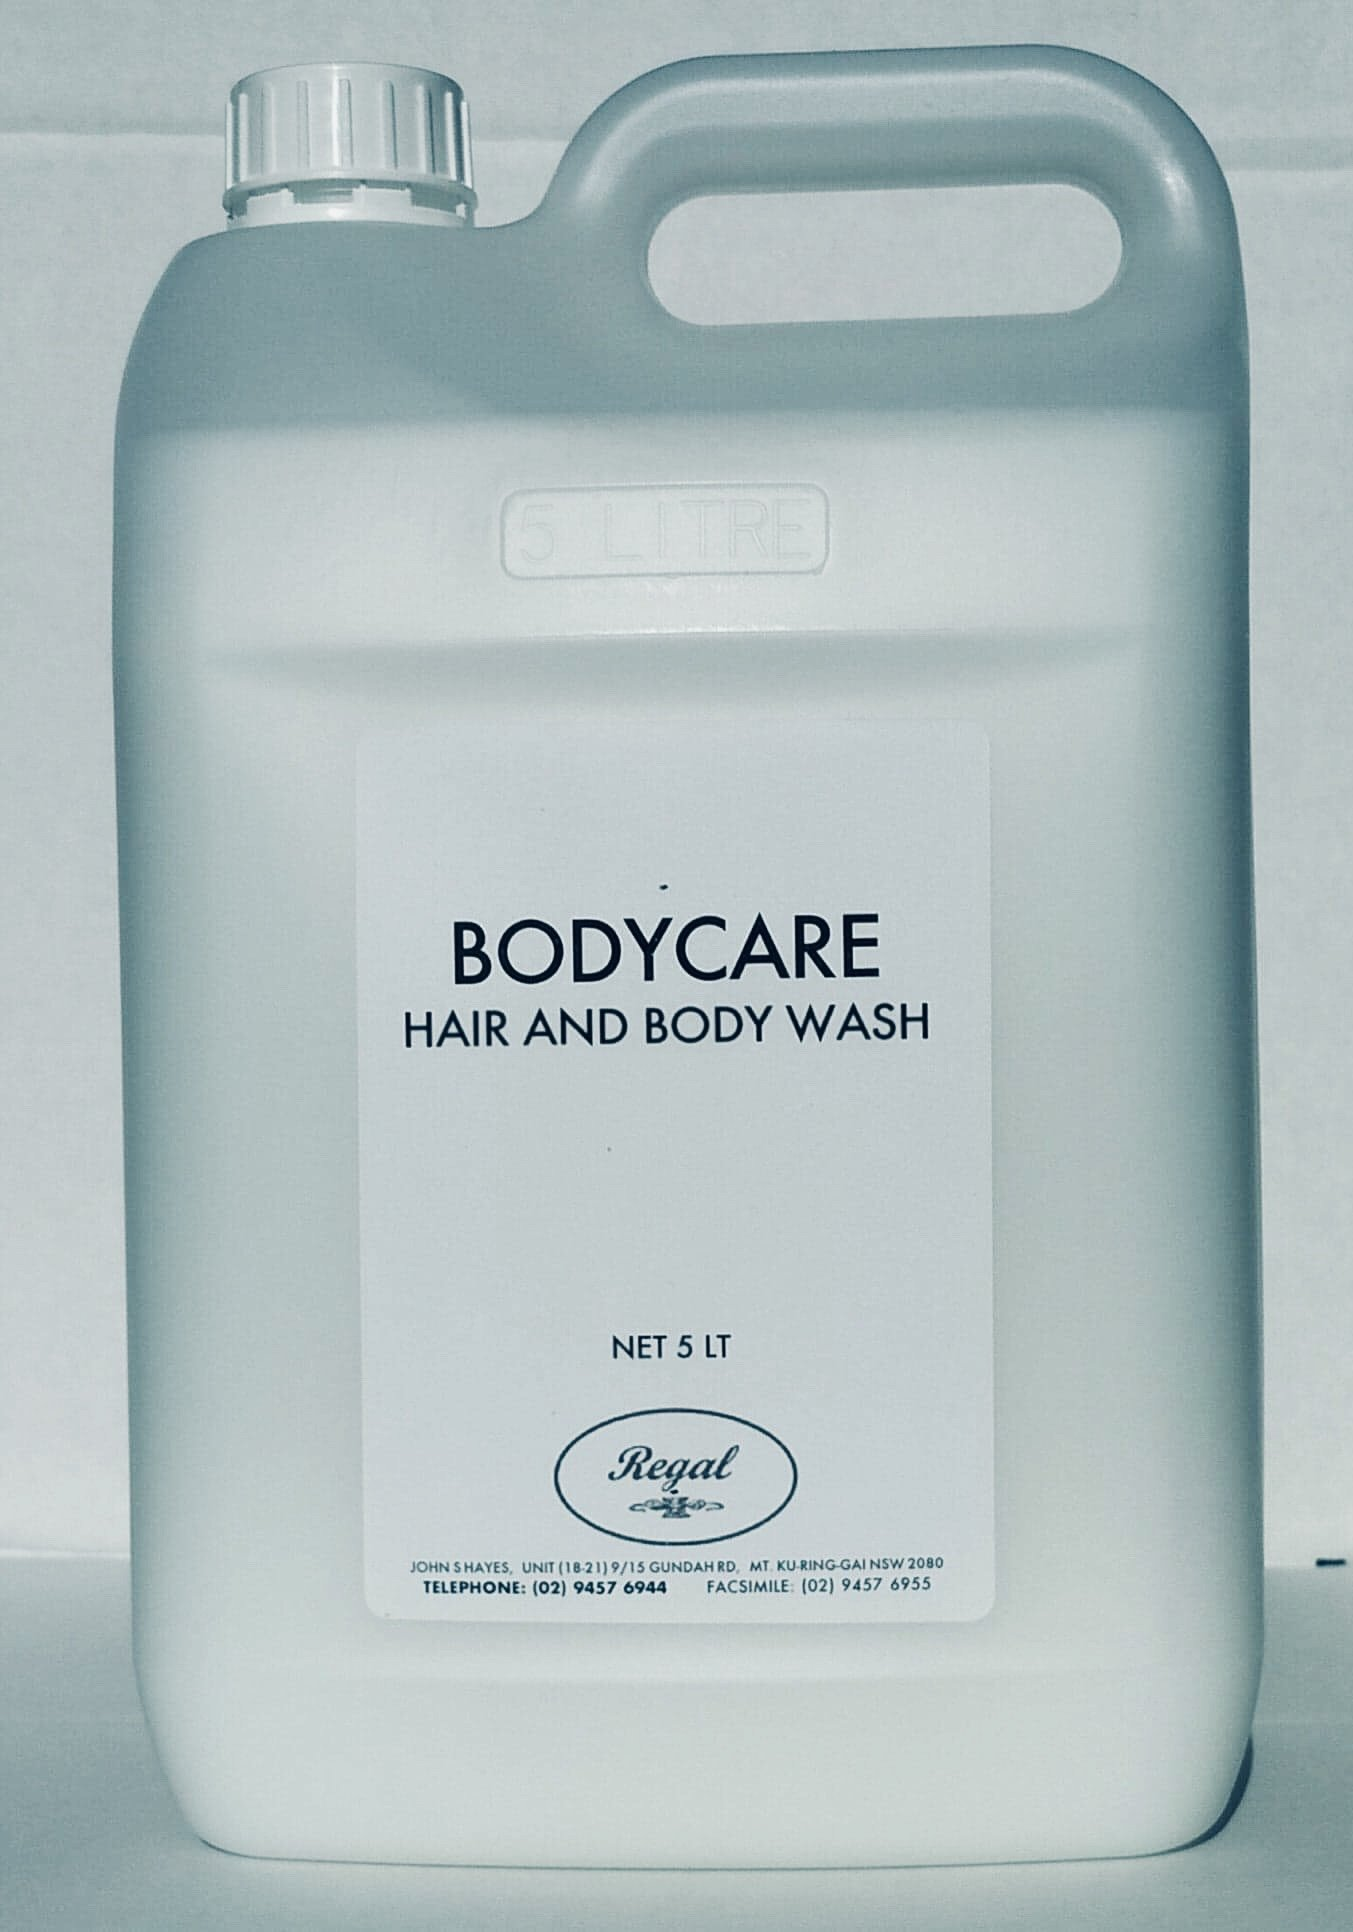 Bodycare Hair & Body Wash 5Ltr